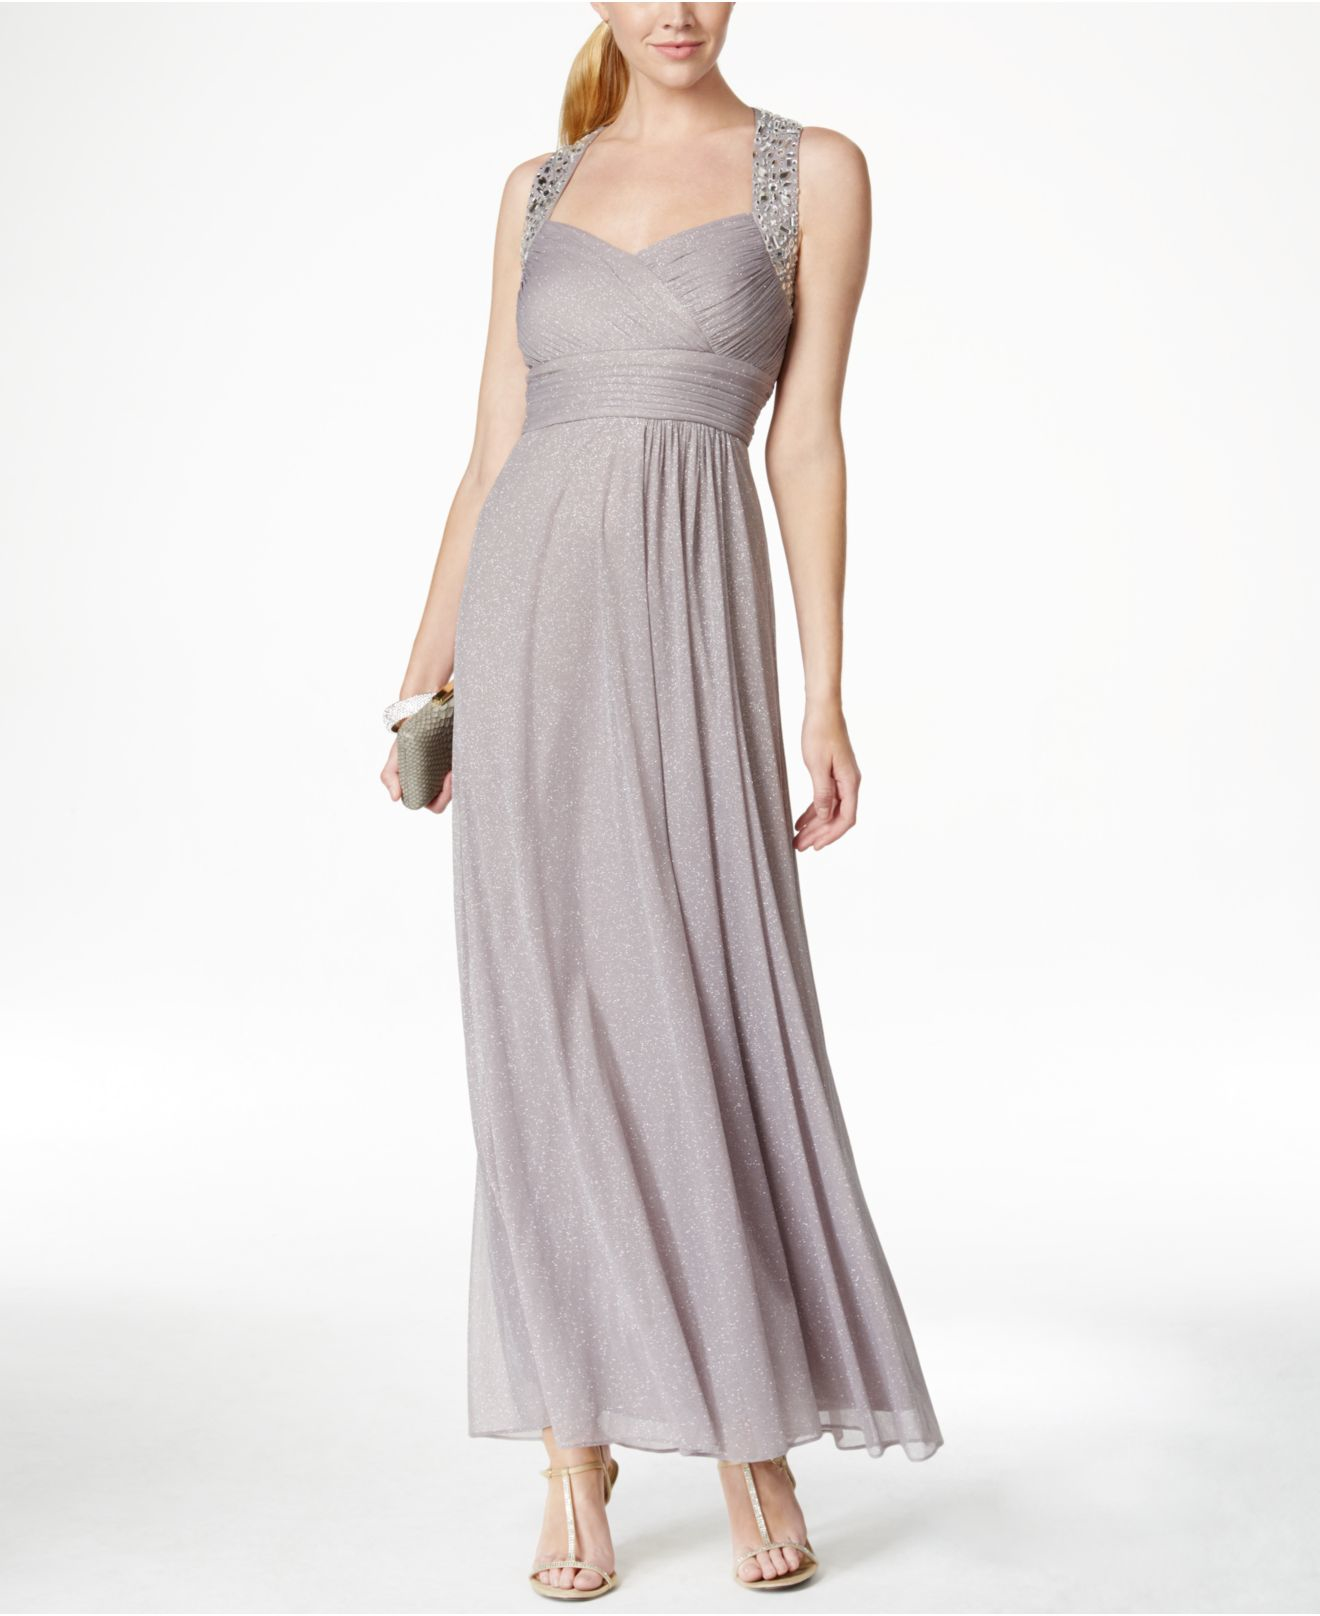 Lyst - Alex Evenings Embellished Glitter-detail Gown in Metallic